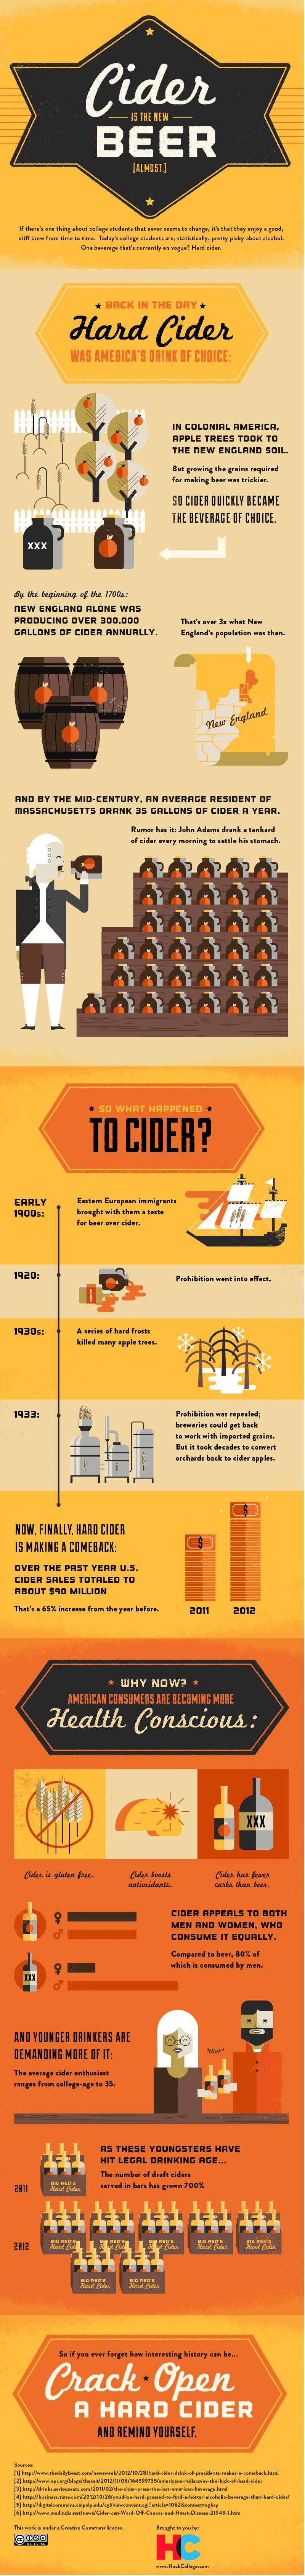 cider-infographic